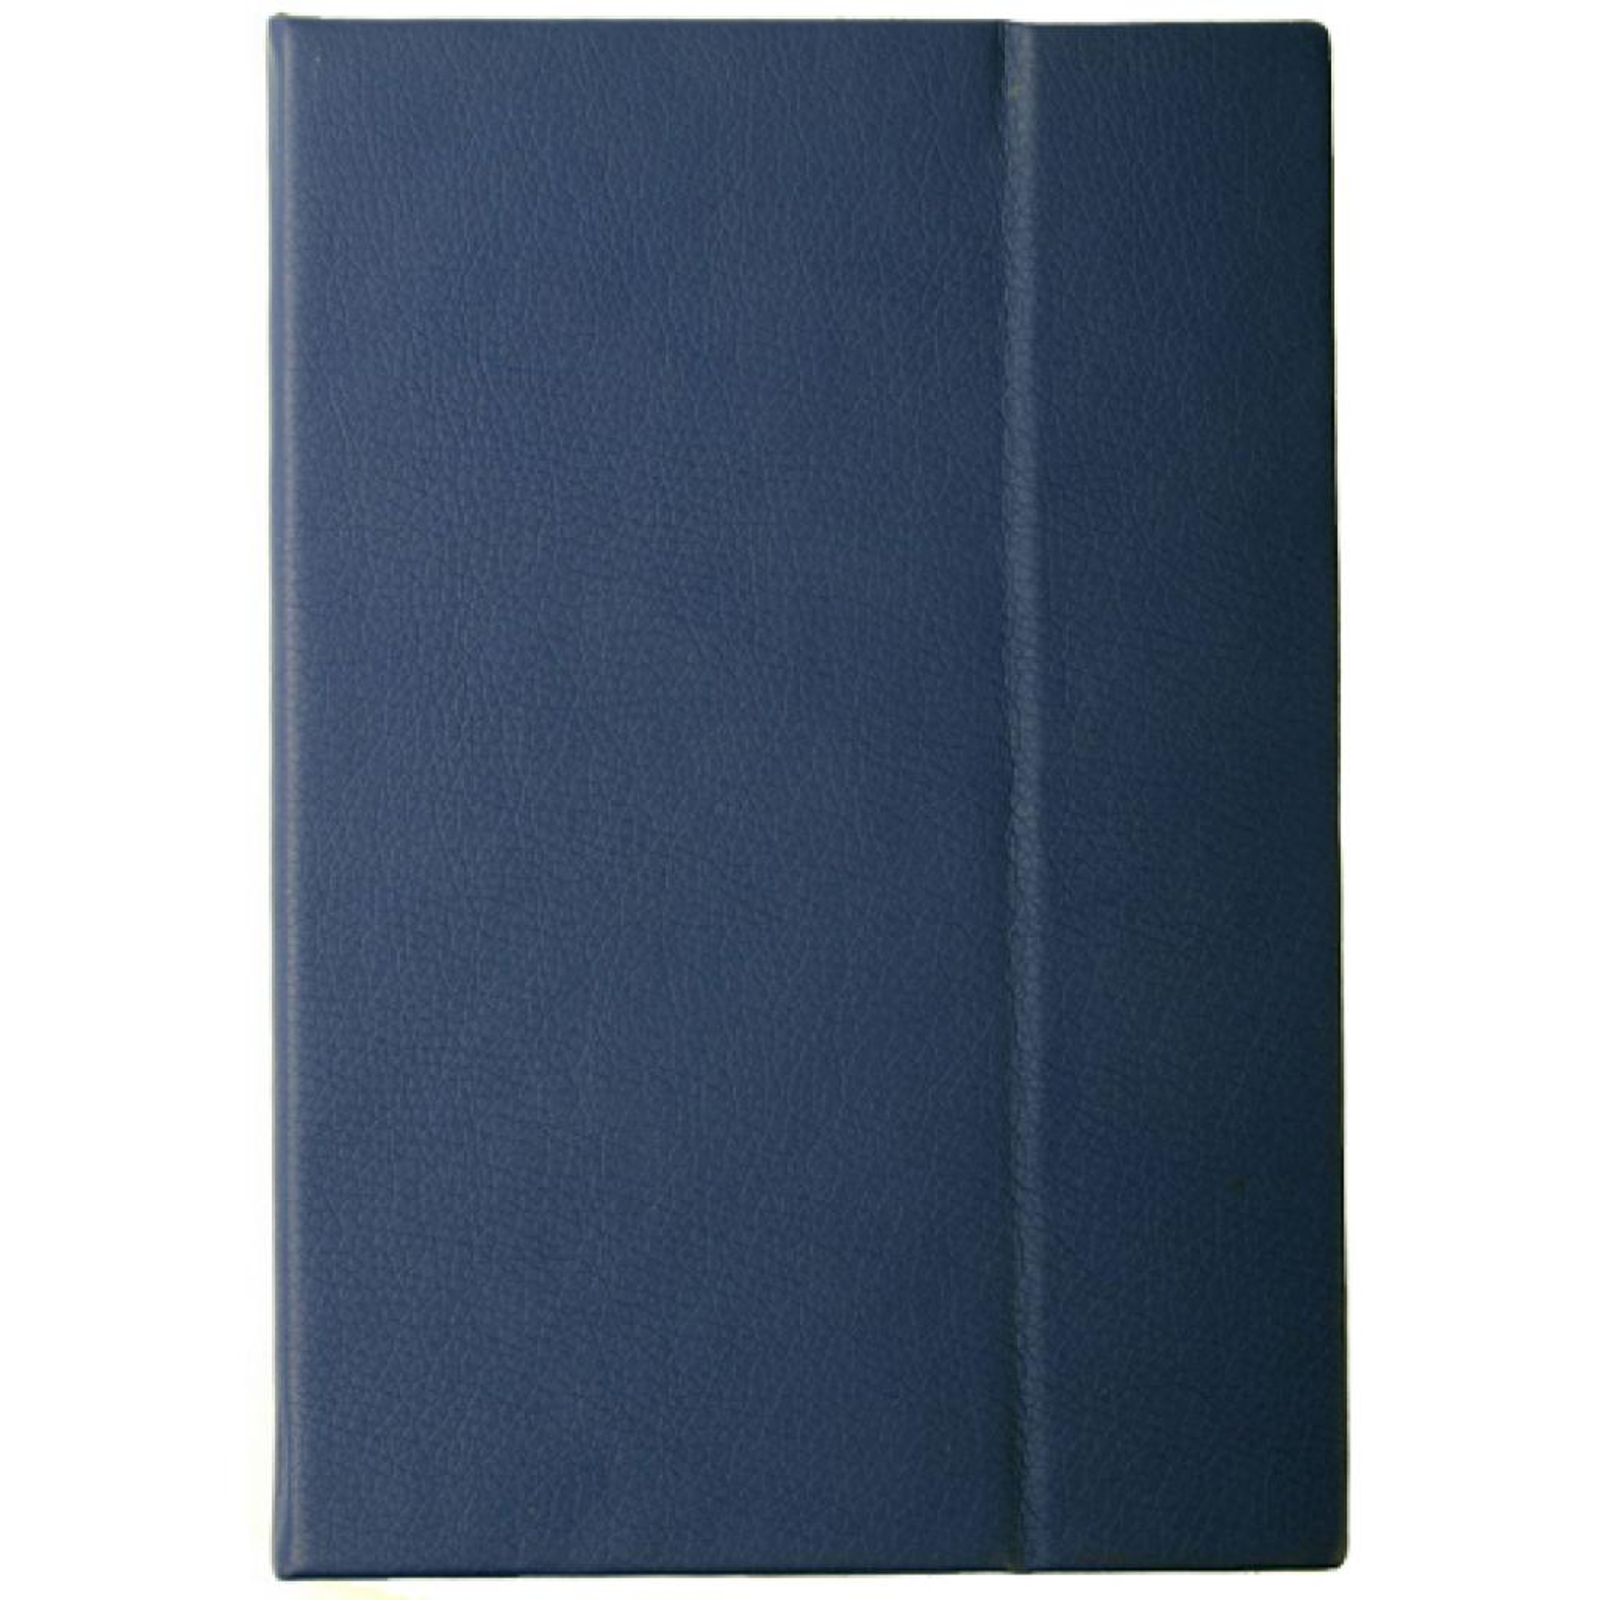 Чехол для планшета Vento 8 Desire Matt - dark blue изображение 2